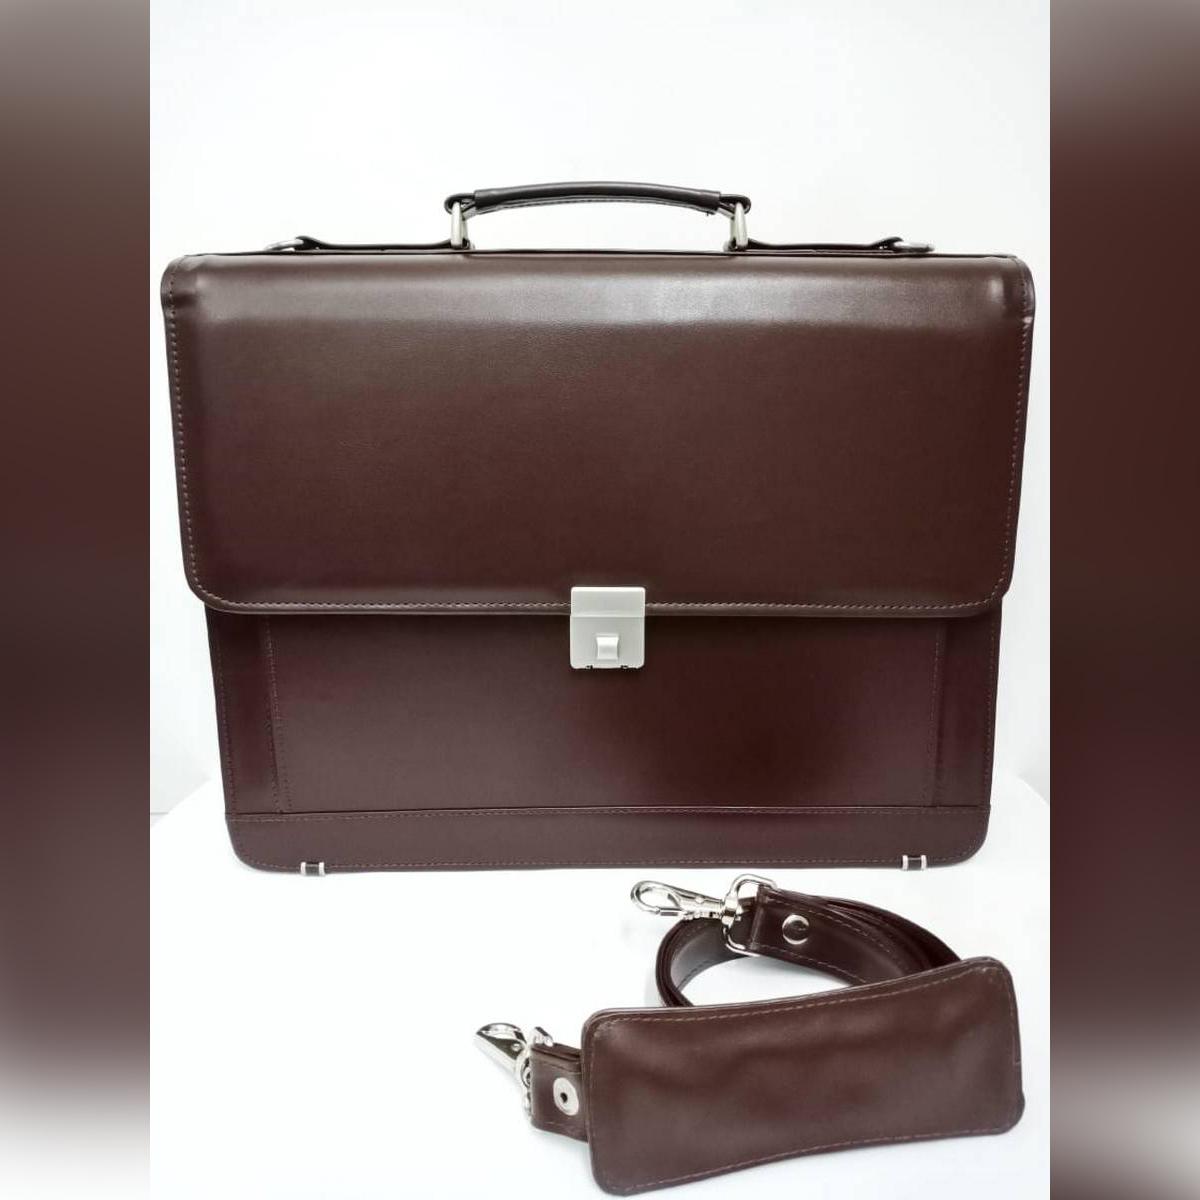 Smart leather bag (PU) / leather men's bag / spacious bag / men office bag / travel bag / lock bag / luggage bag /shoulder bag / briefcase bag / anti-theft bag / big bag / laptop bag / business bag / executive PU leather bag / file bag/ document bag